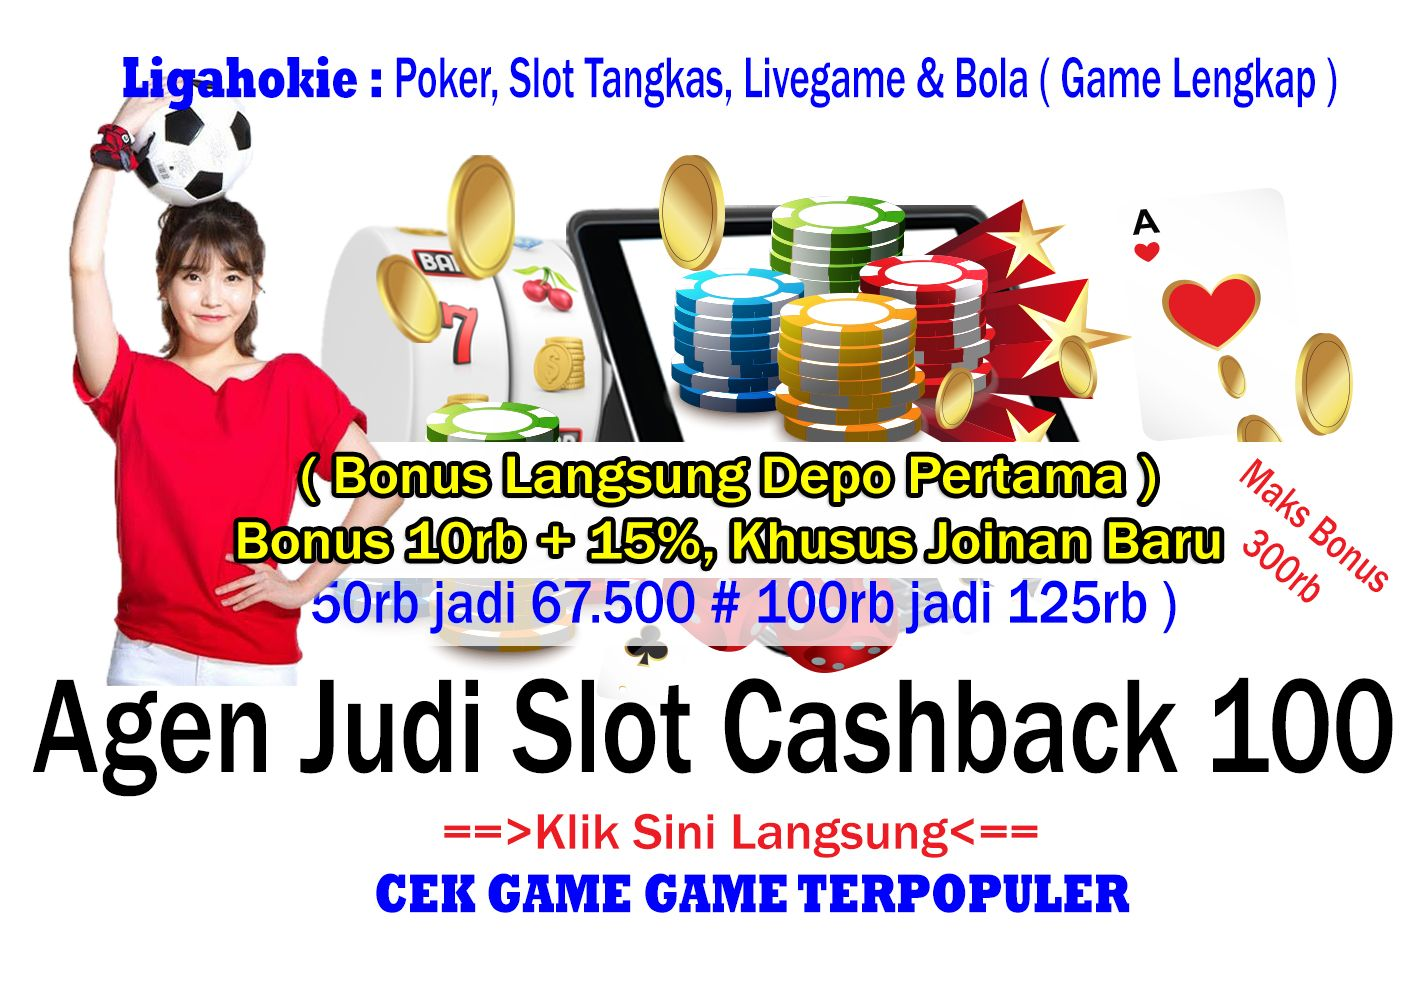 Pin On Agen Judi Slot Cashback 100